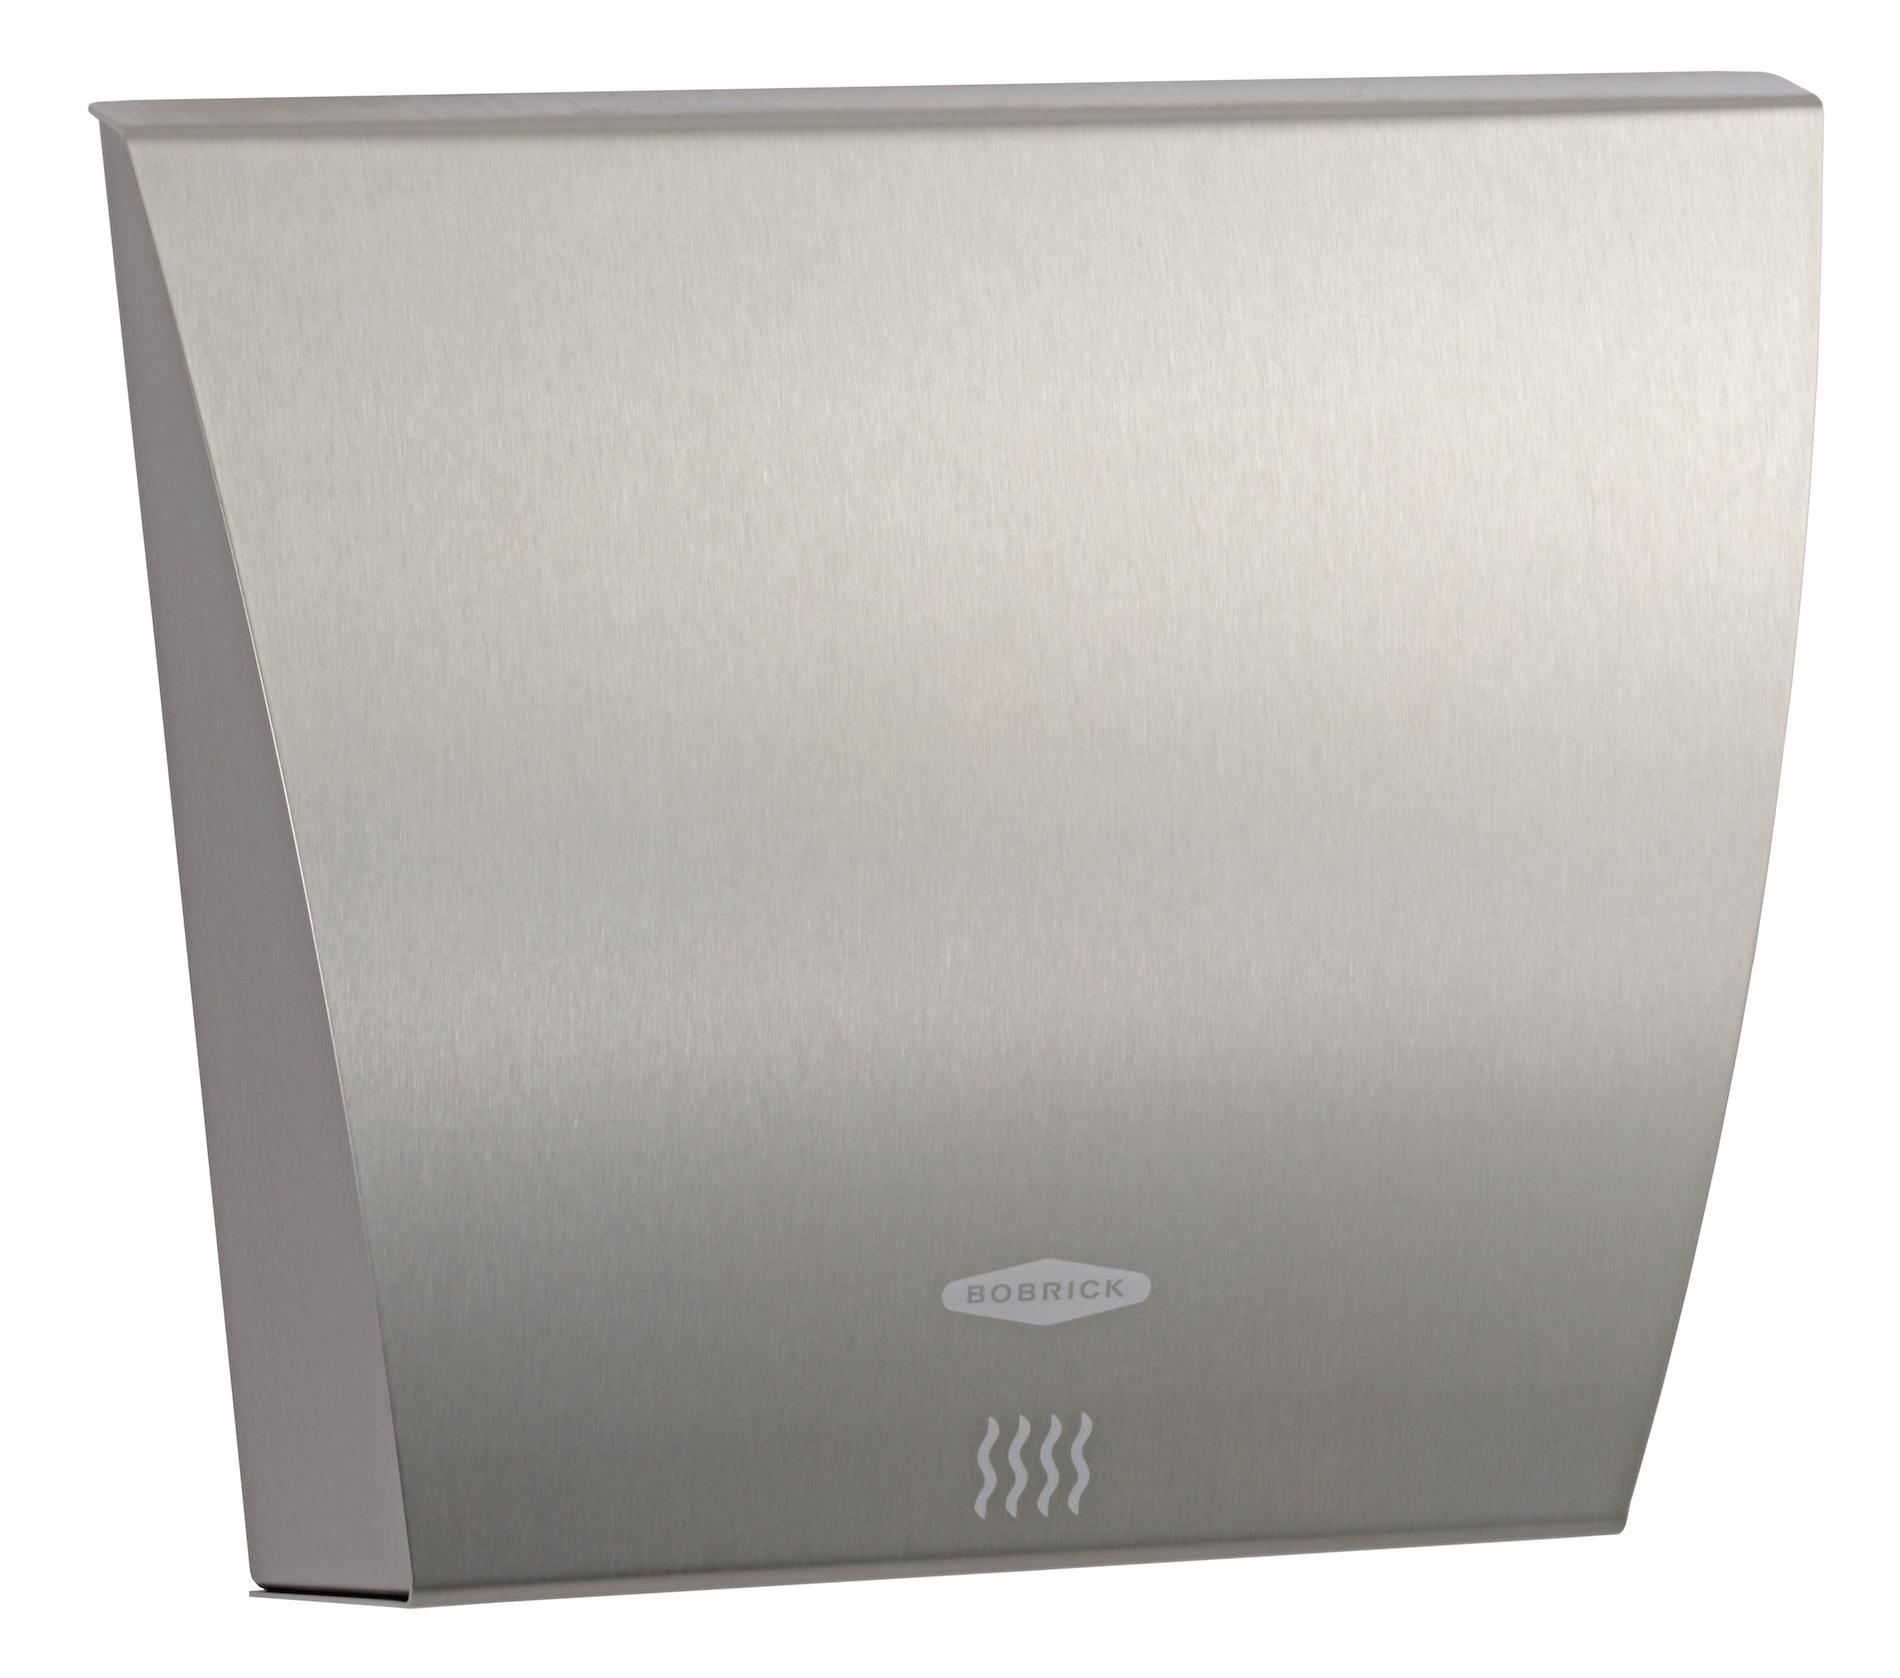 Bobrick-B-7125-Hand-Dryer